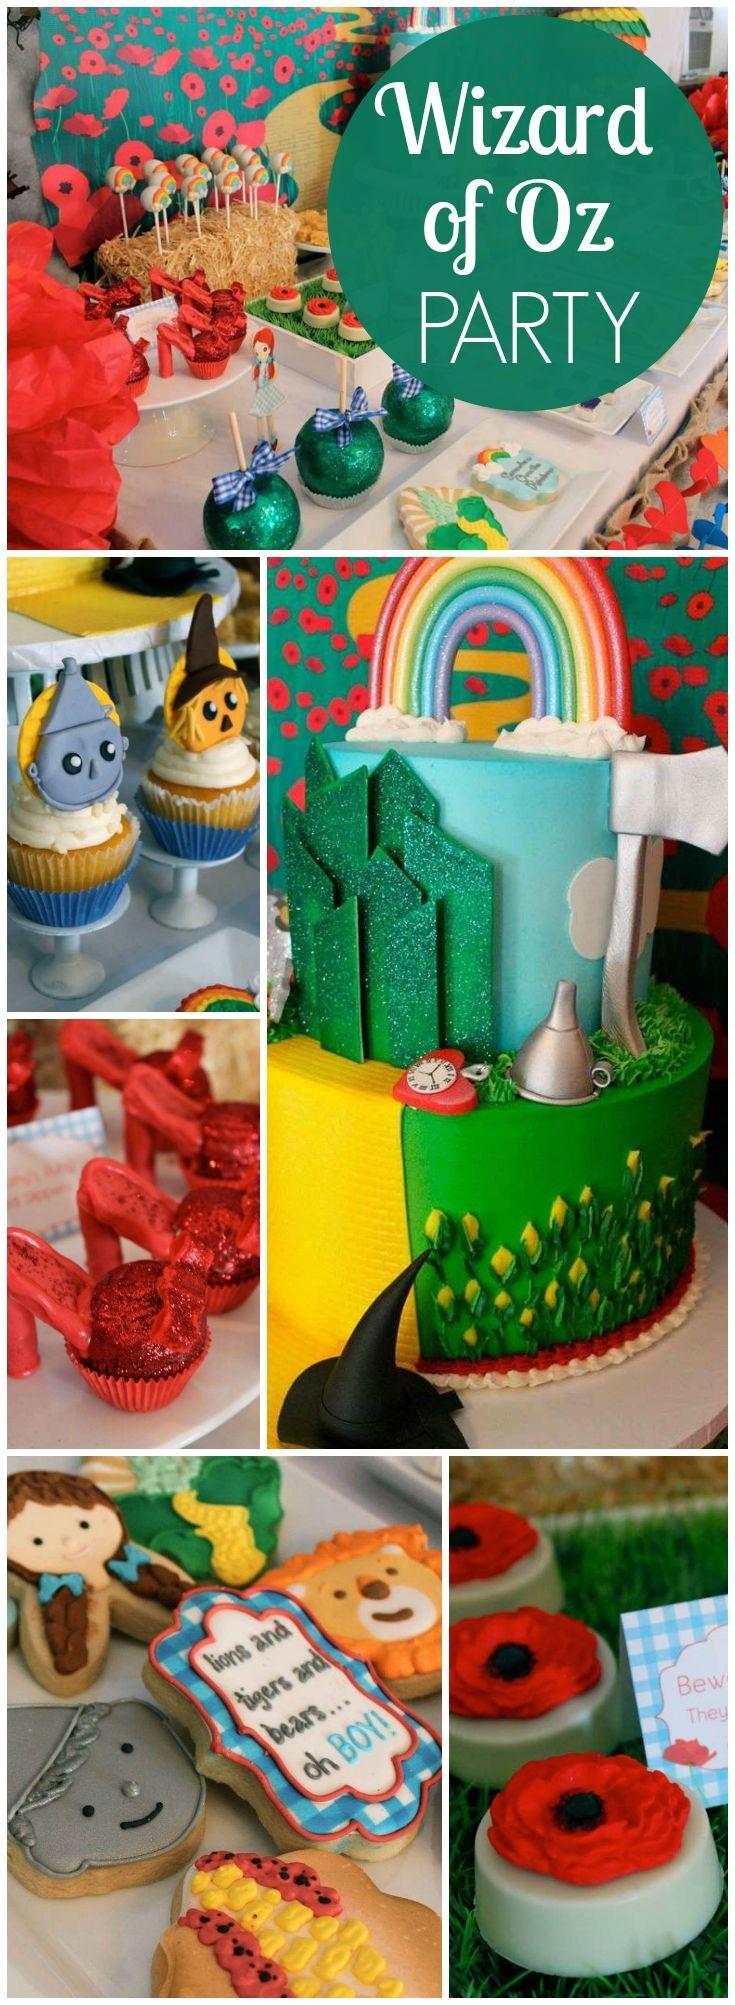 Wizard Of Oz Baby Shower Wizard Of Oz Baby Shower Wizard Of